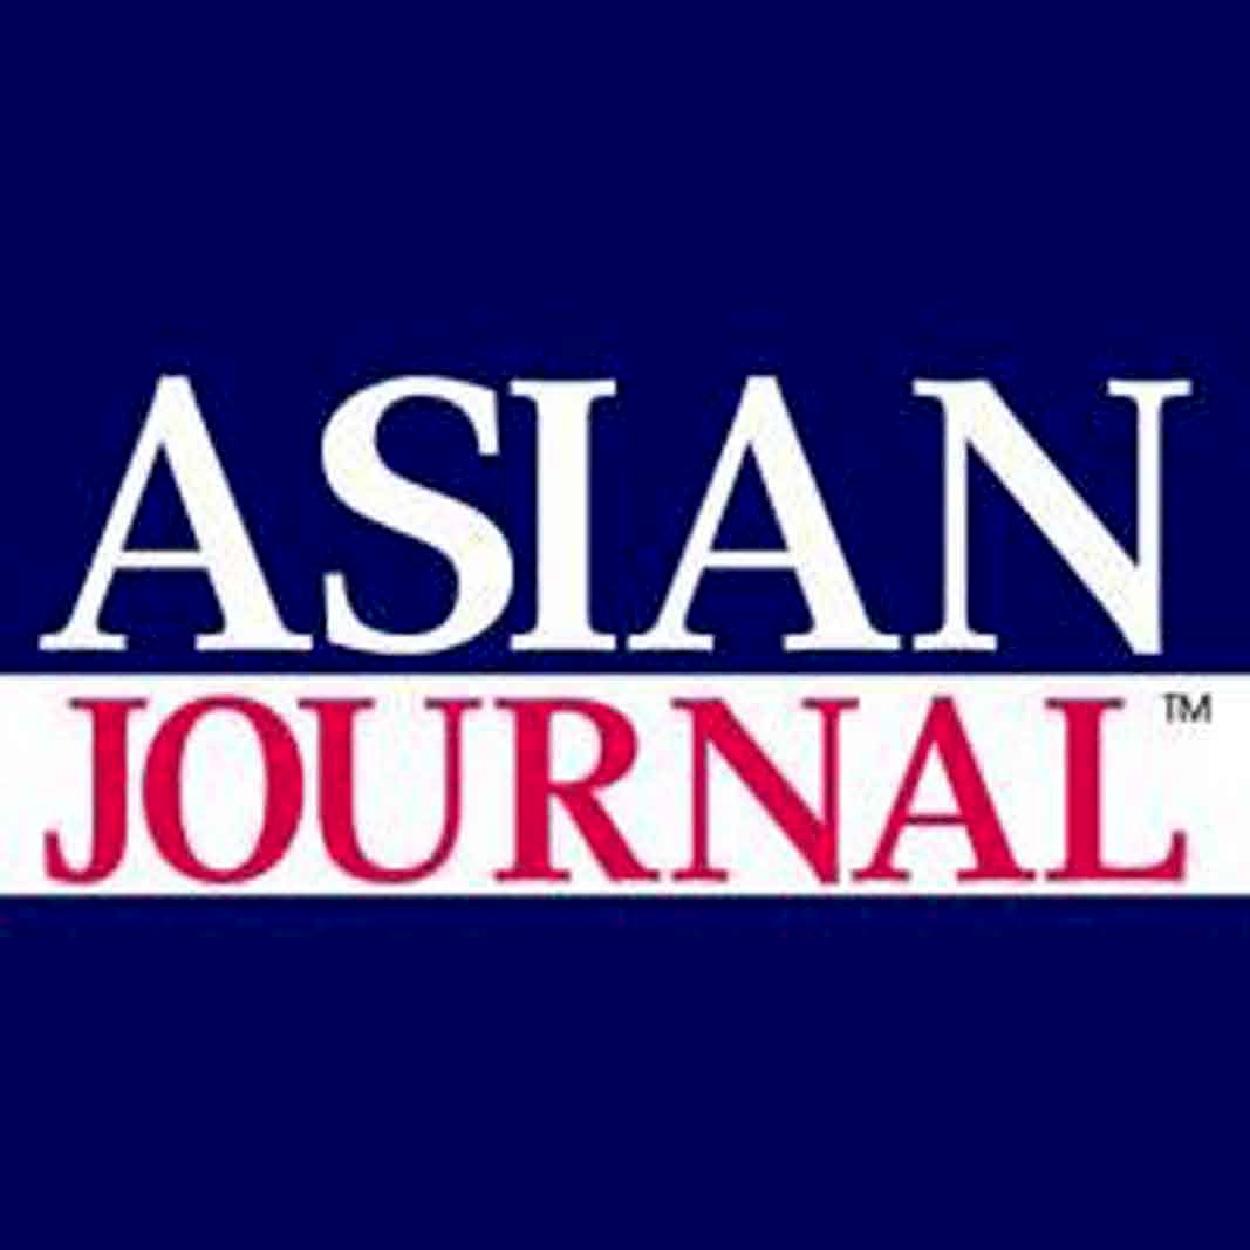 www.asianjournal.com